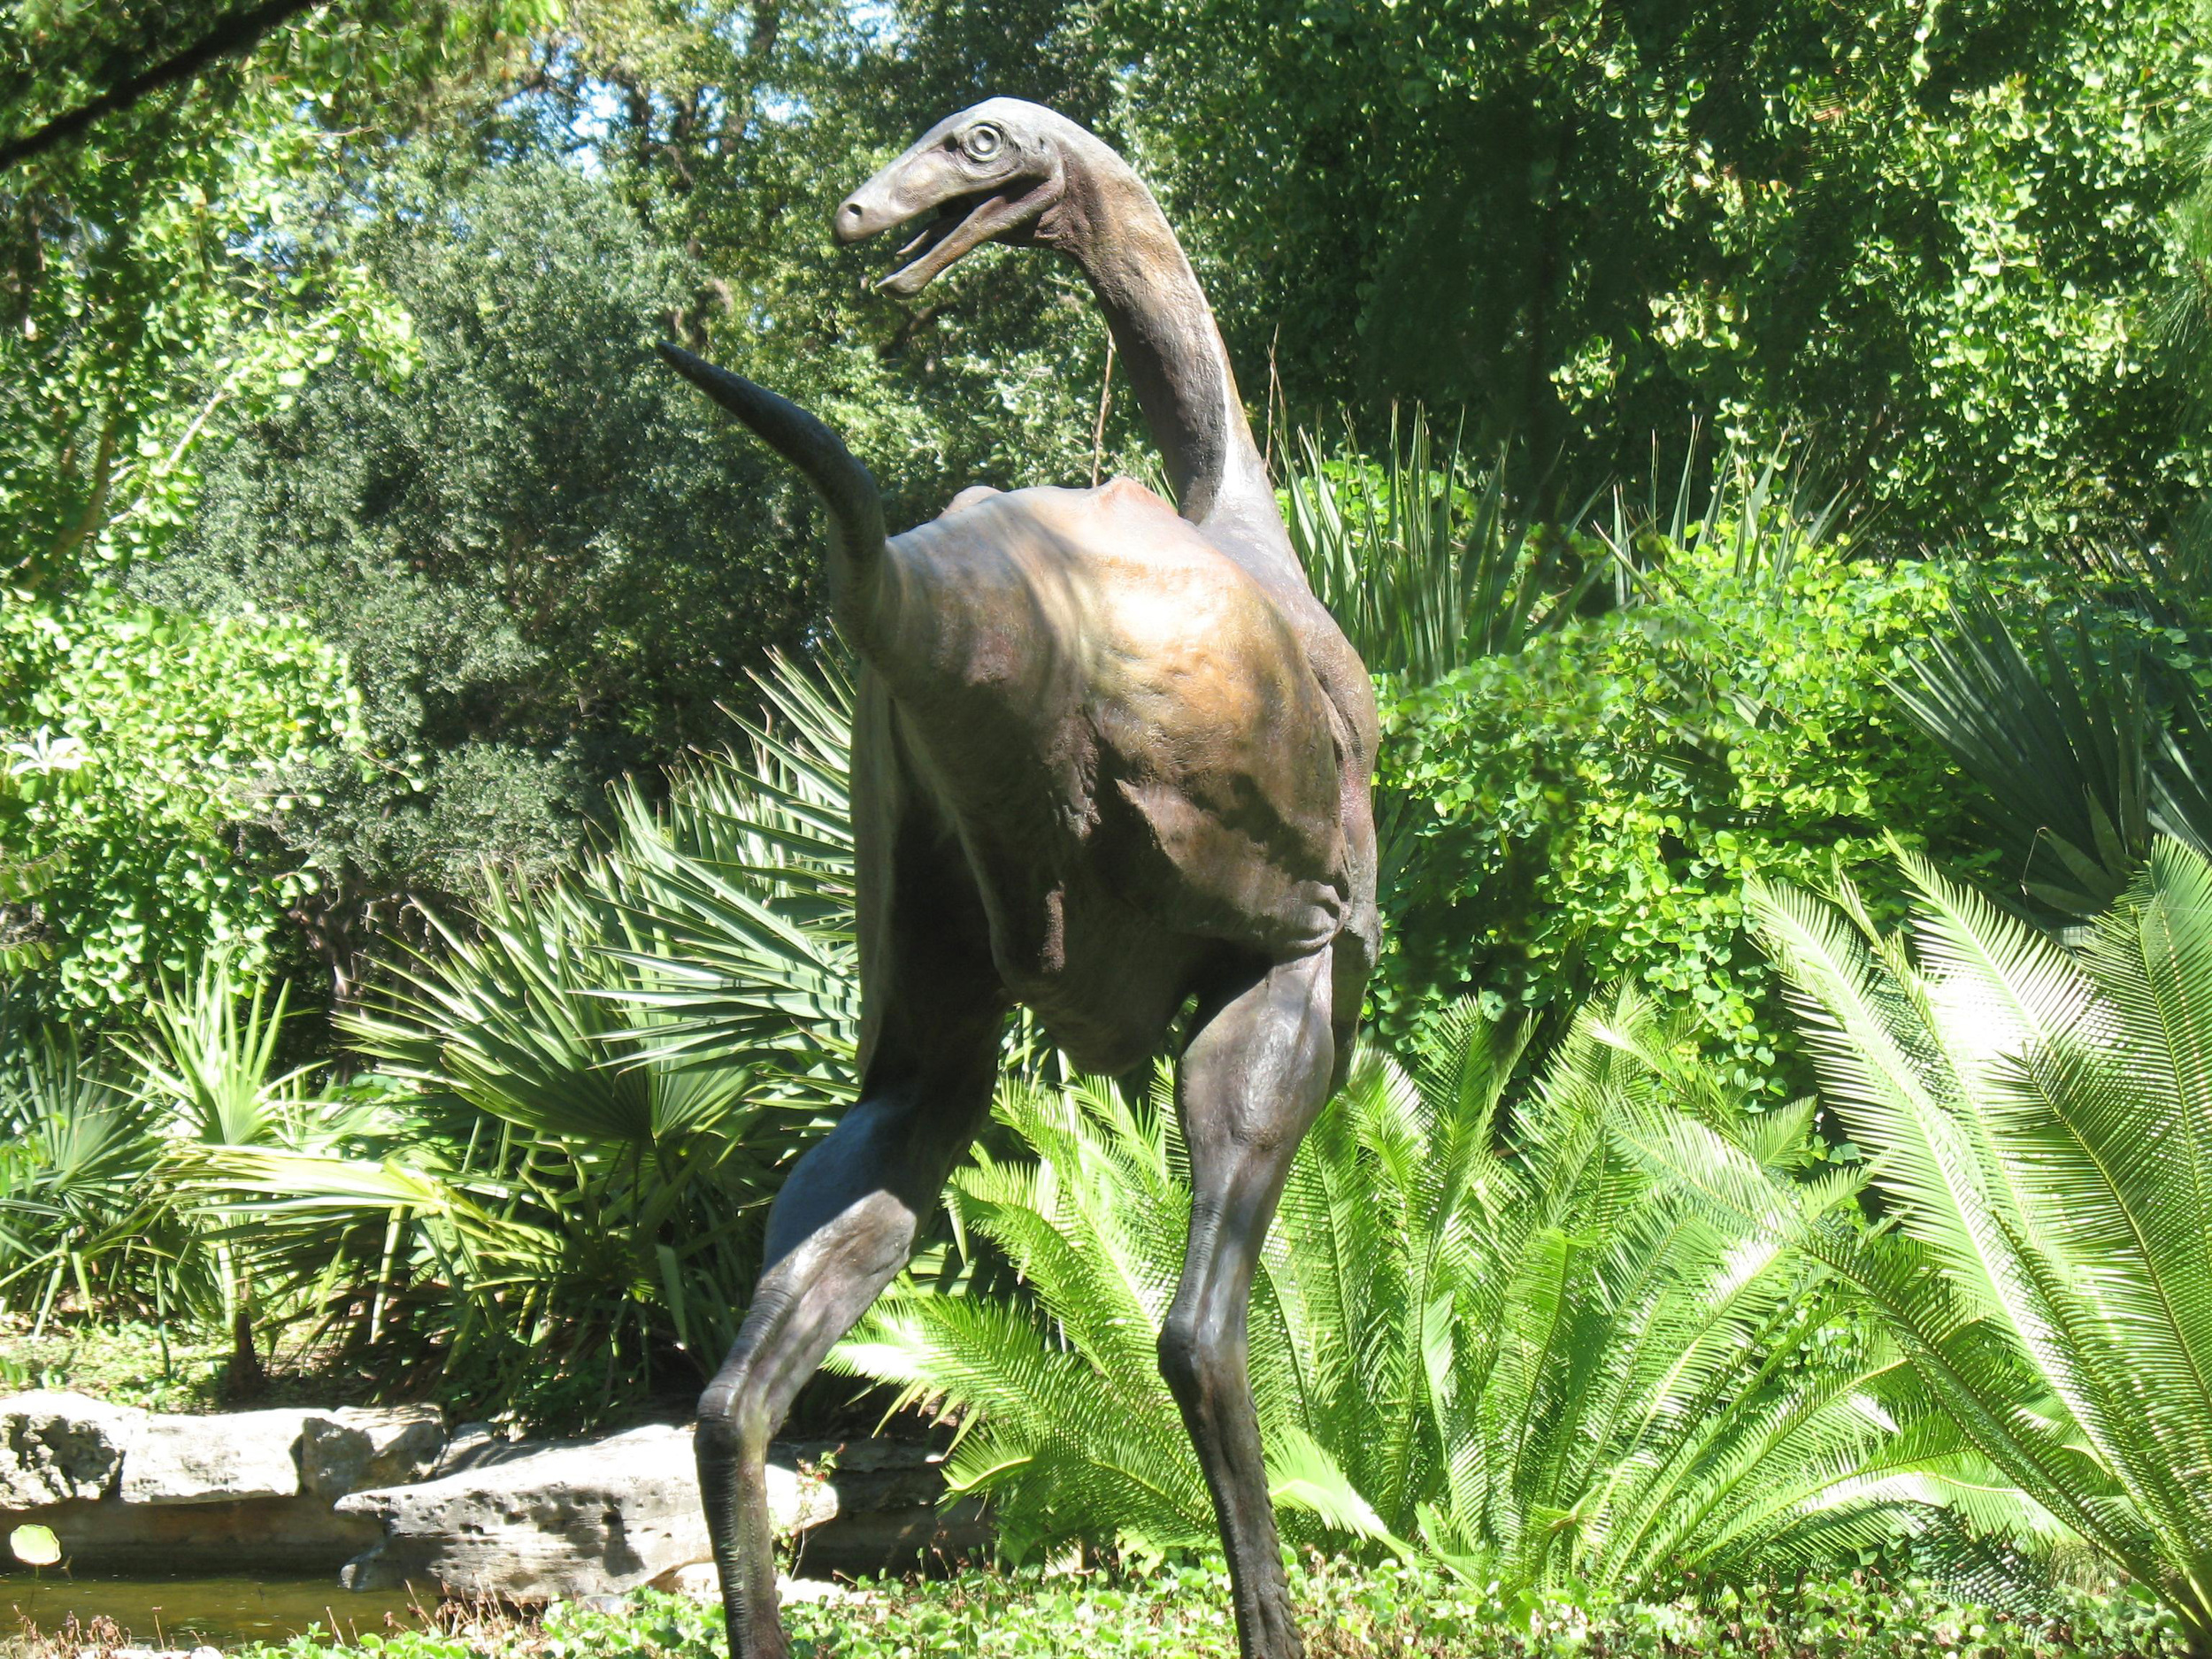 bronze-dinosaur-ornithomimid-statue-john-maisano-5.jpg